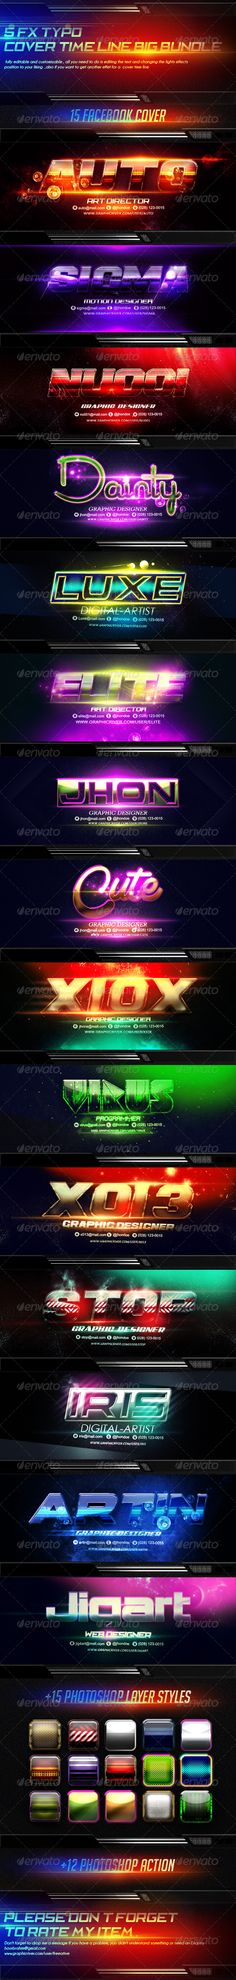 15 FX Typo Facebook Cover Timeline Bundle — Photoshop PSD #designer #digital • Available here → https://graphicriver.net/item/15-fx-typo-facebook-cover-timeline-bundle/8296394?ref=pxcr